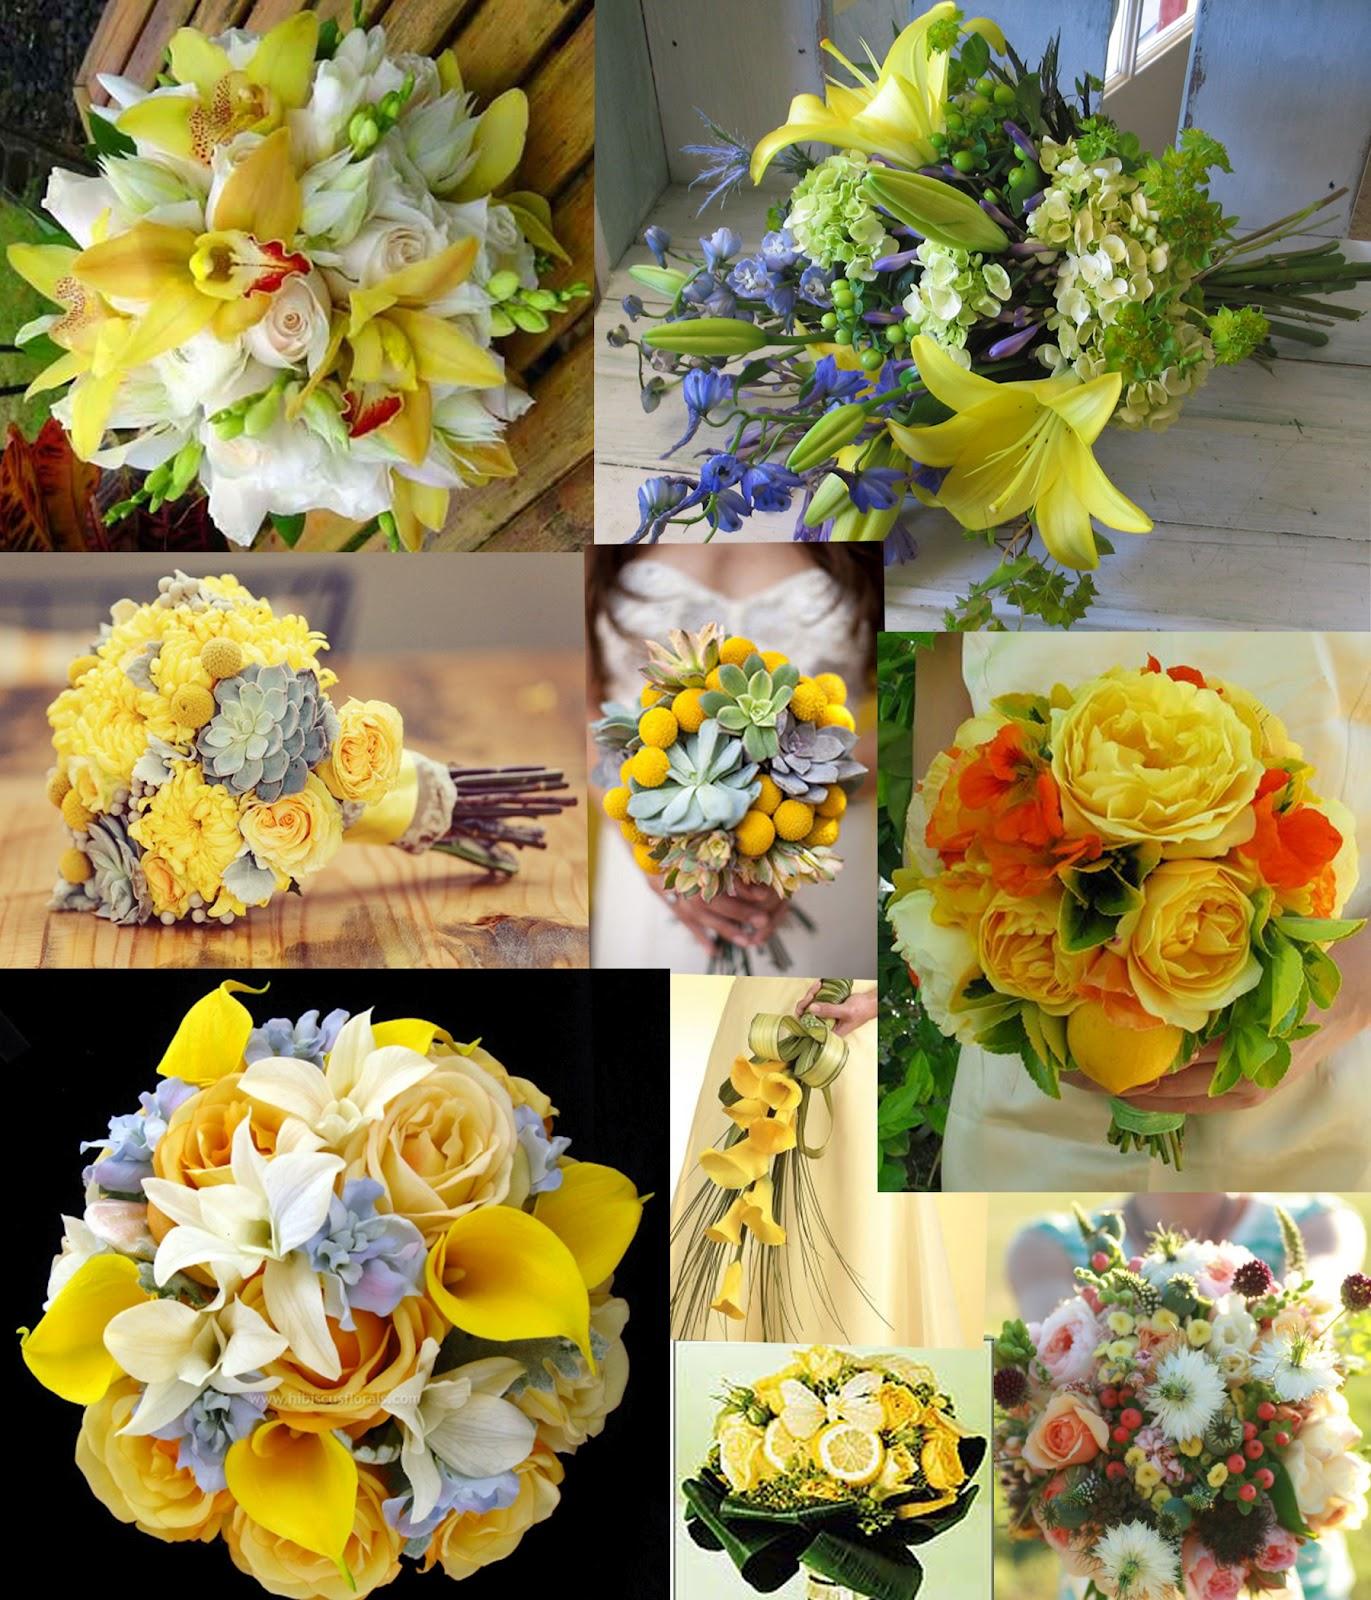 Summer Wedding Flowers Ideas: Weddingzilla: Lemon Wedding Theme JUICY Summer Wedding Ideas